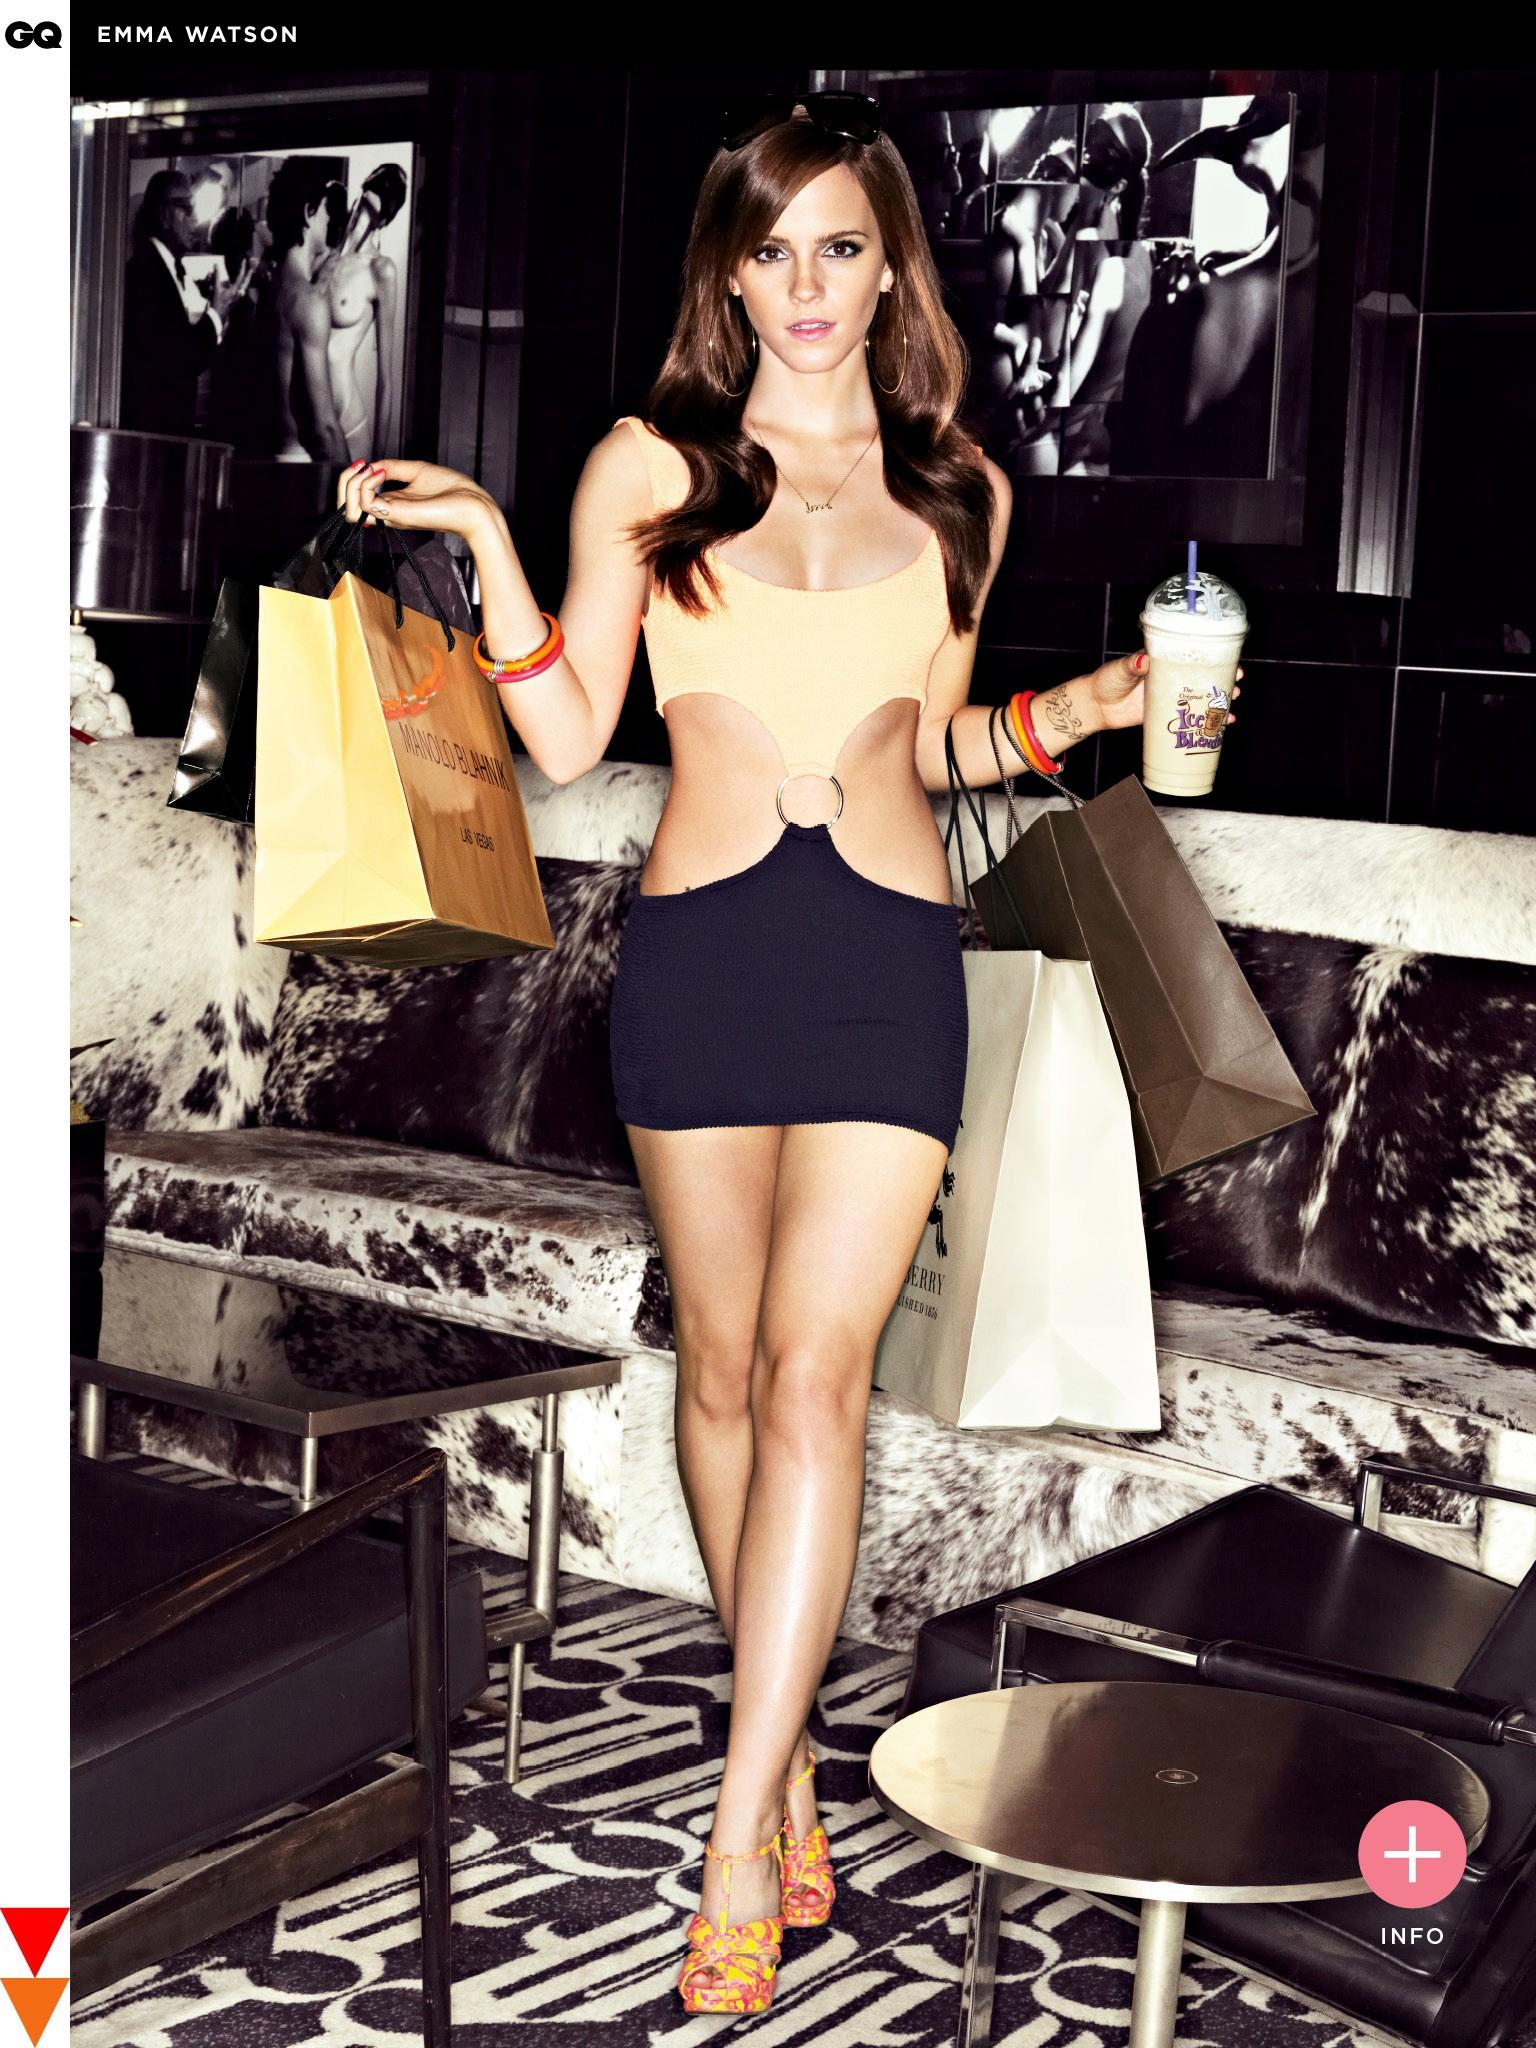 Emma-Watson---GQ-magazine-2013--01.jpg